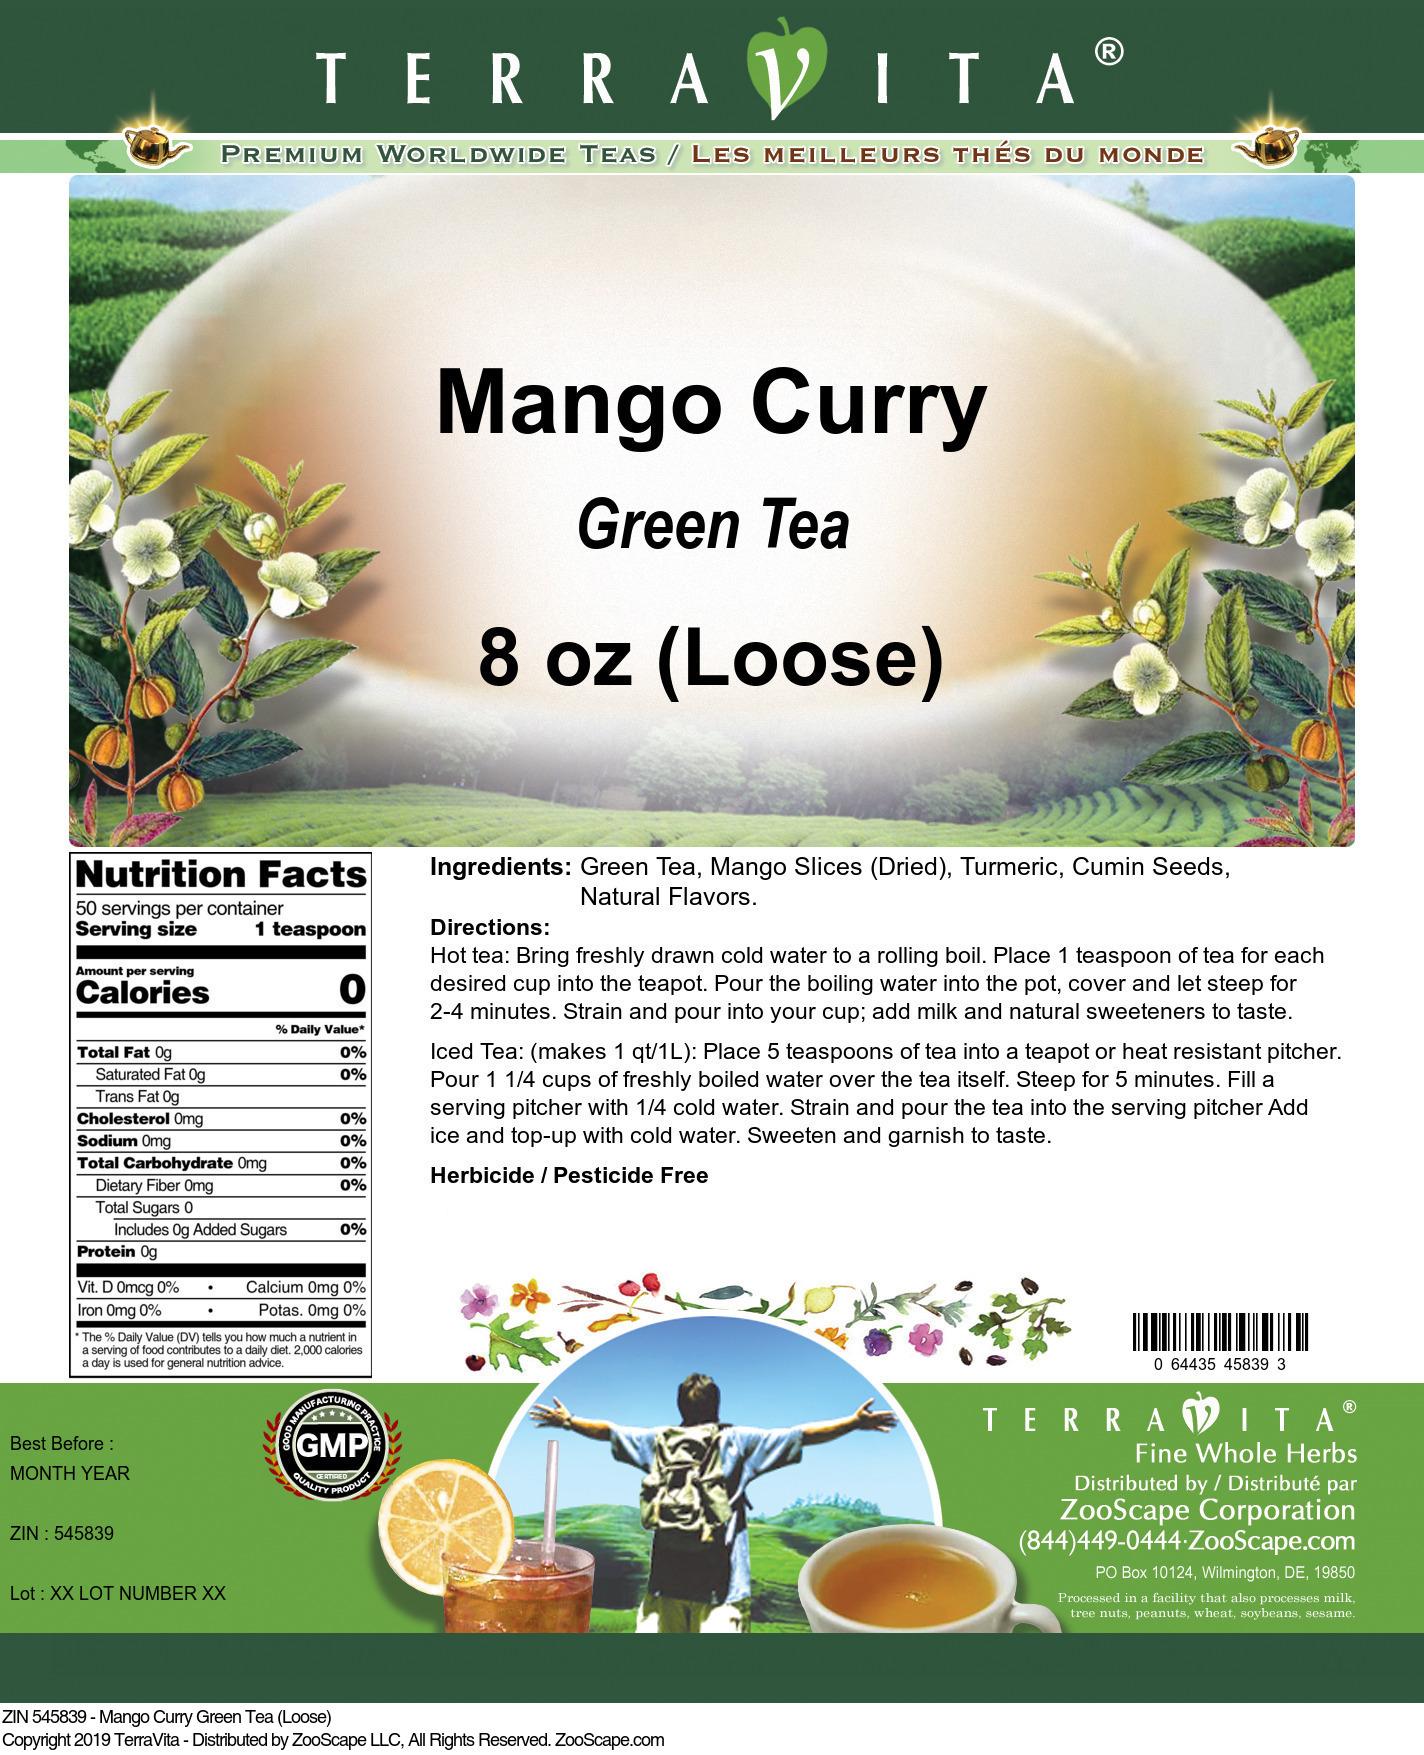 Mango Curry Green Tea (Loose)